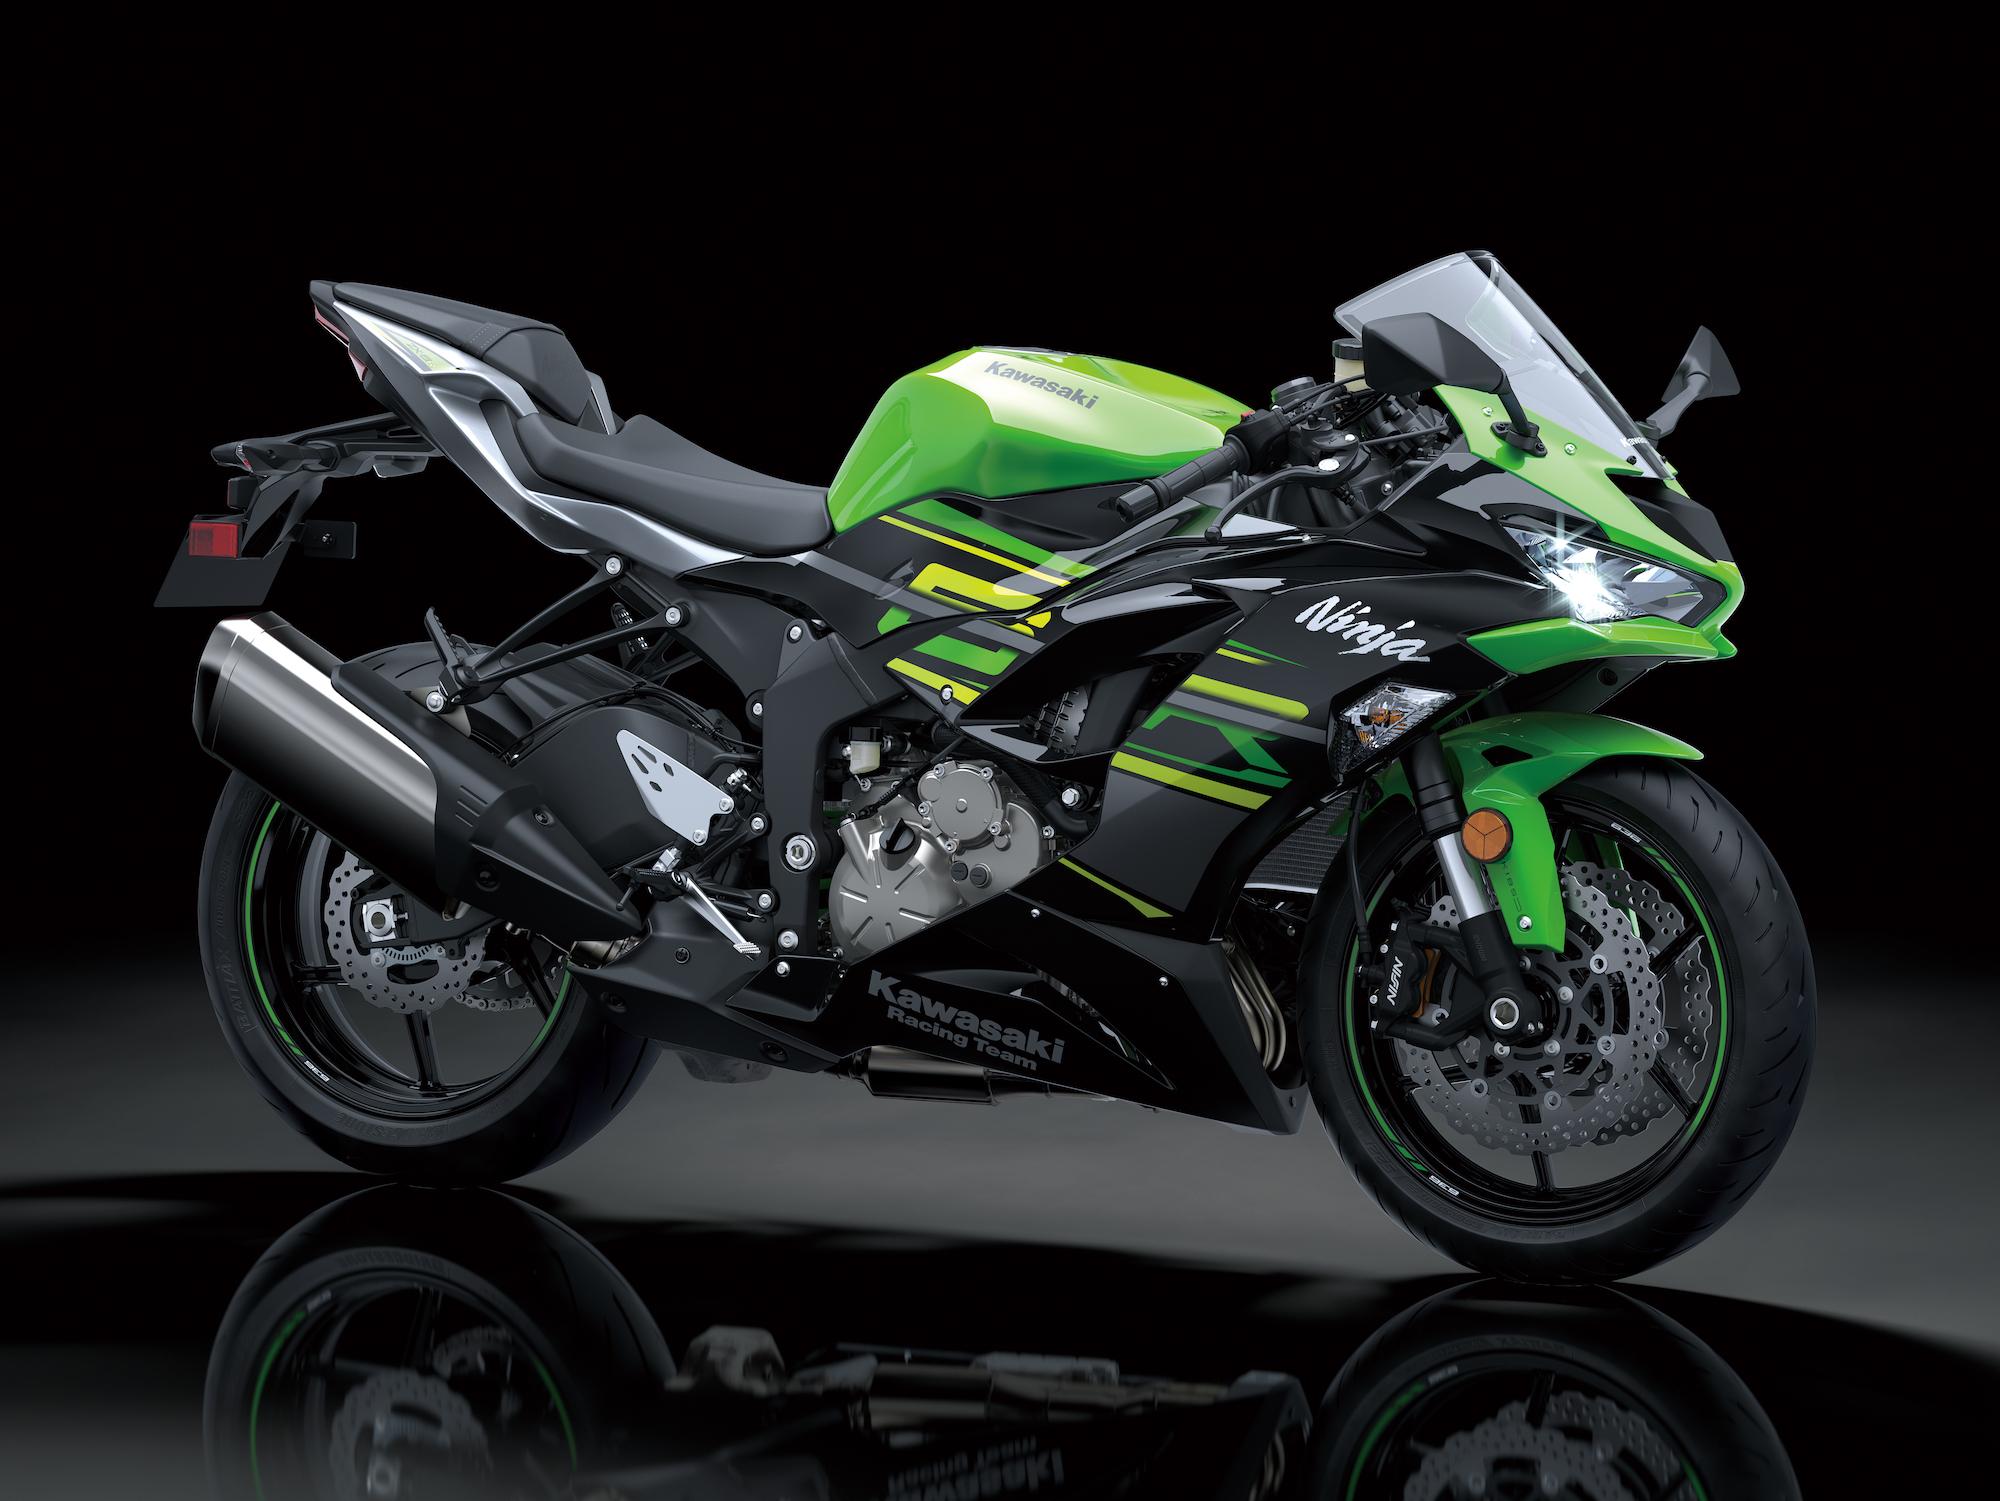 Kawasaki announces new ZX6R 636 for 2019 | Superbike Magazine